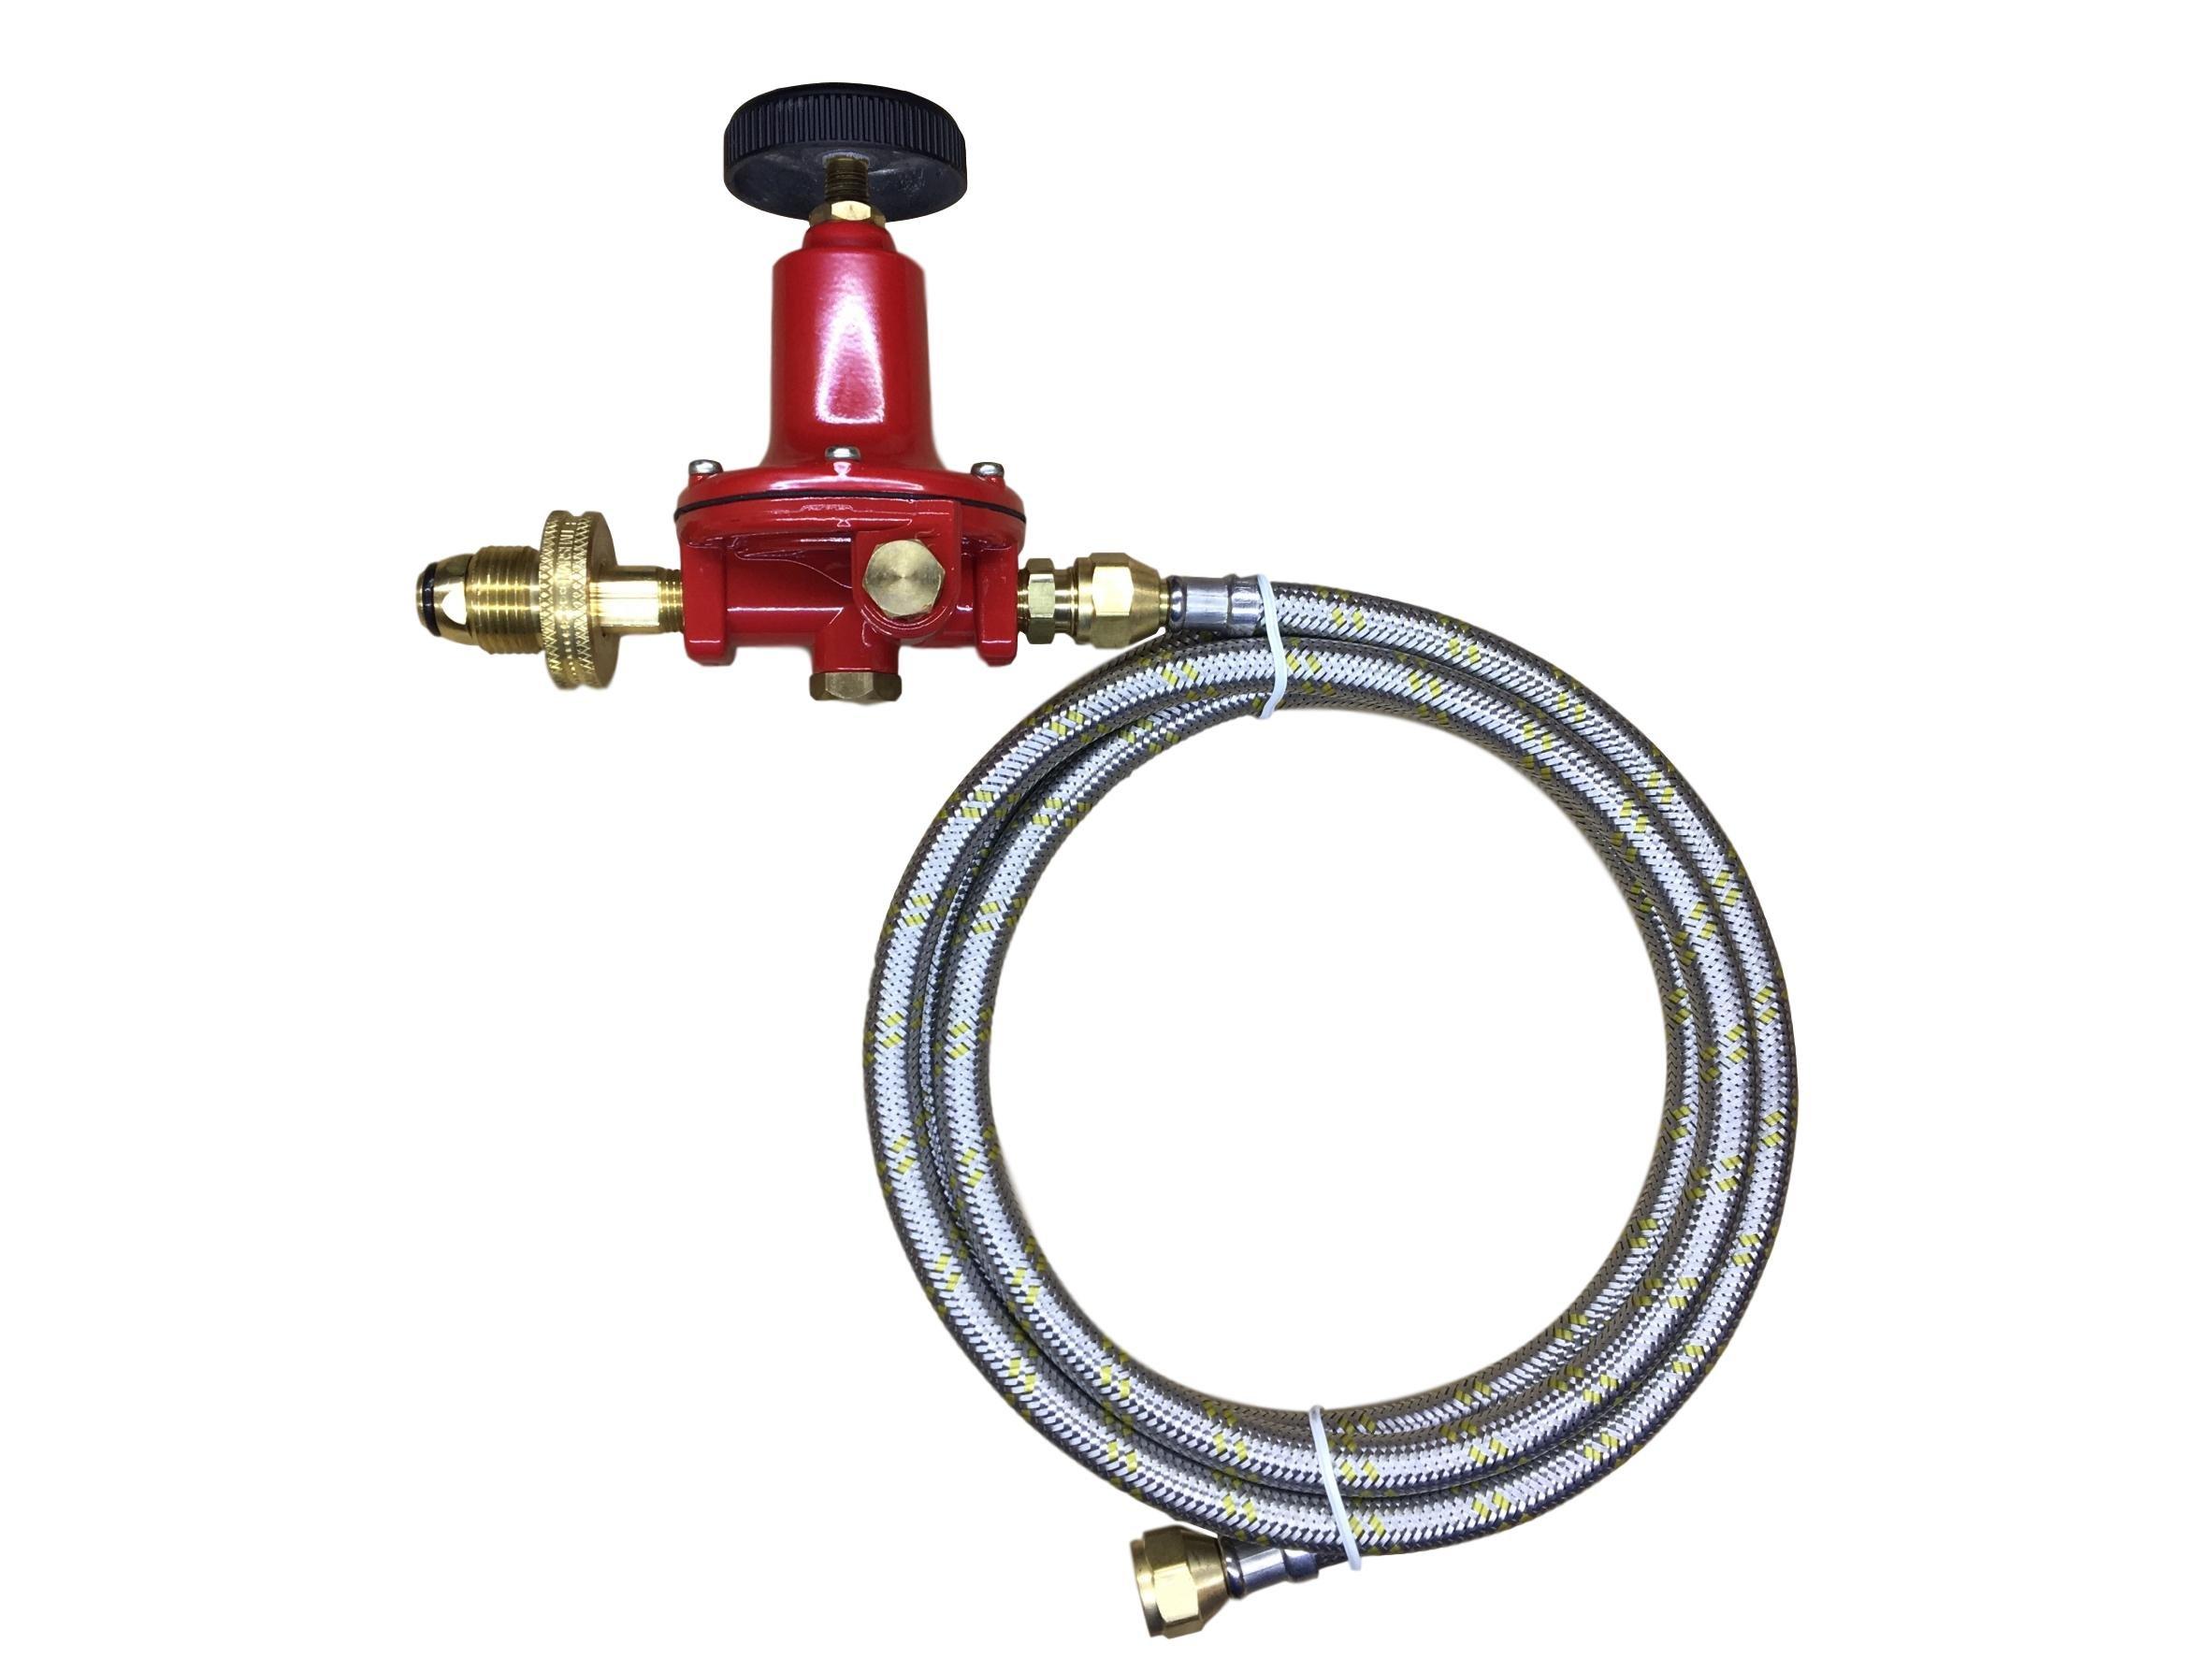 Propane LP Gas Adjustable 0-100psi High Pressure Regulator Soft POL Brass Hand Wheel Connector, Gauge and 16ft Stainless Steel Braided Hose